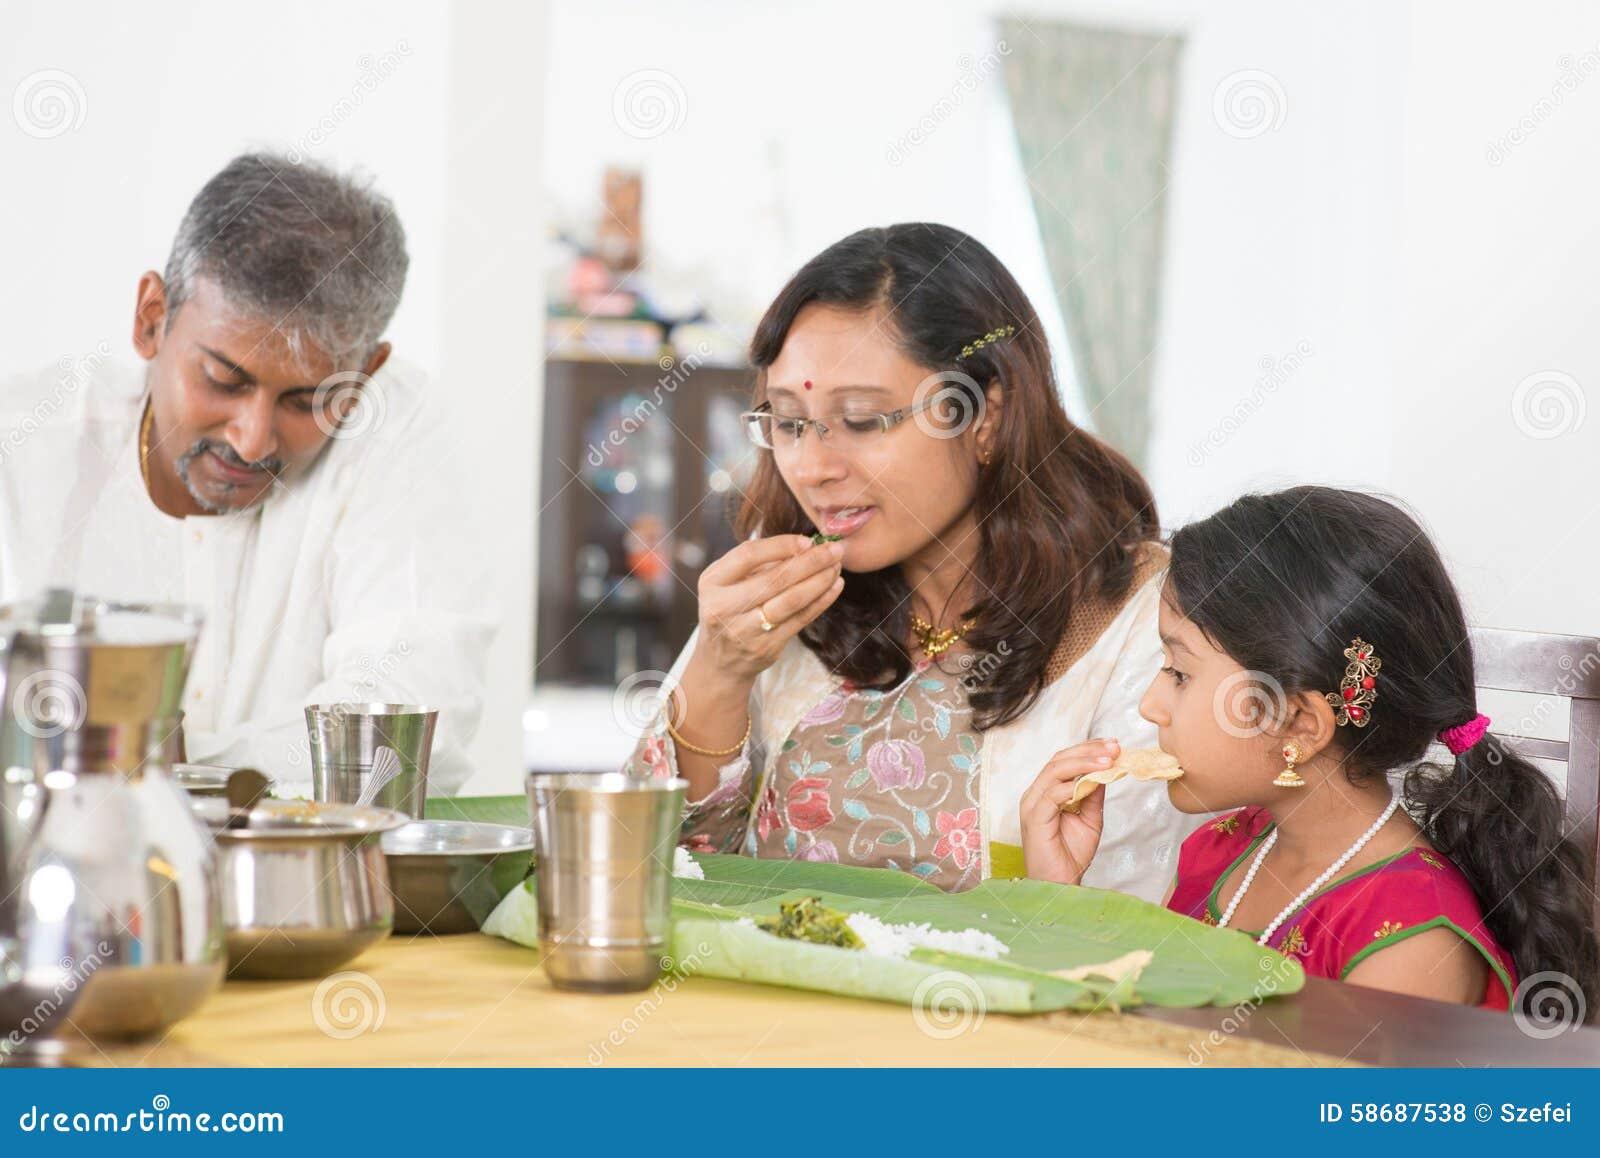 Design House Plans Online India Indian Family Eating Banana Leaf Rice Stock Photo Image